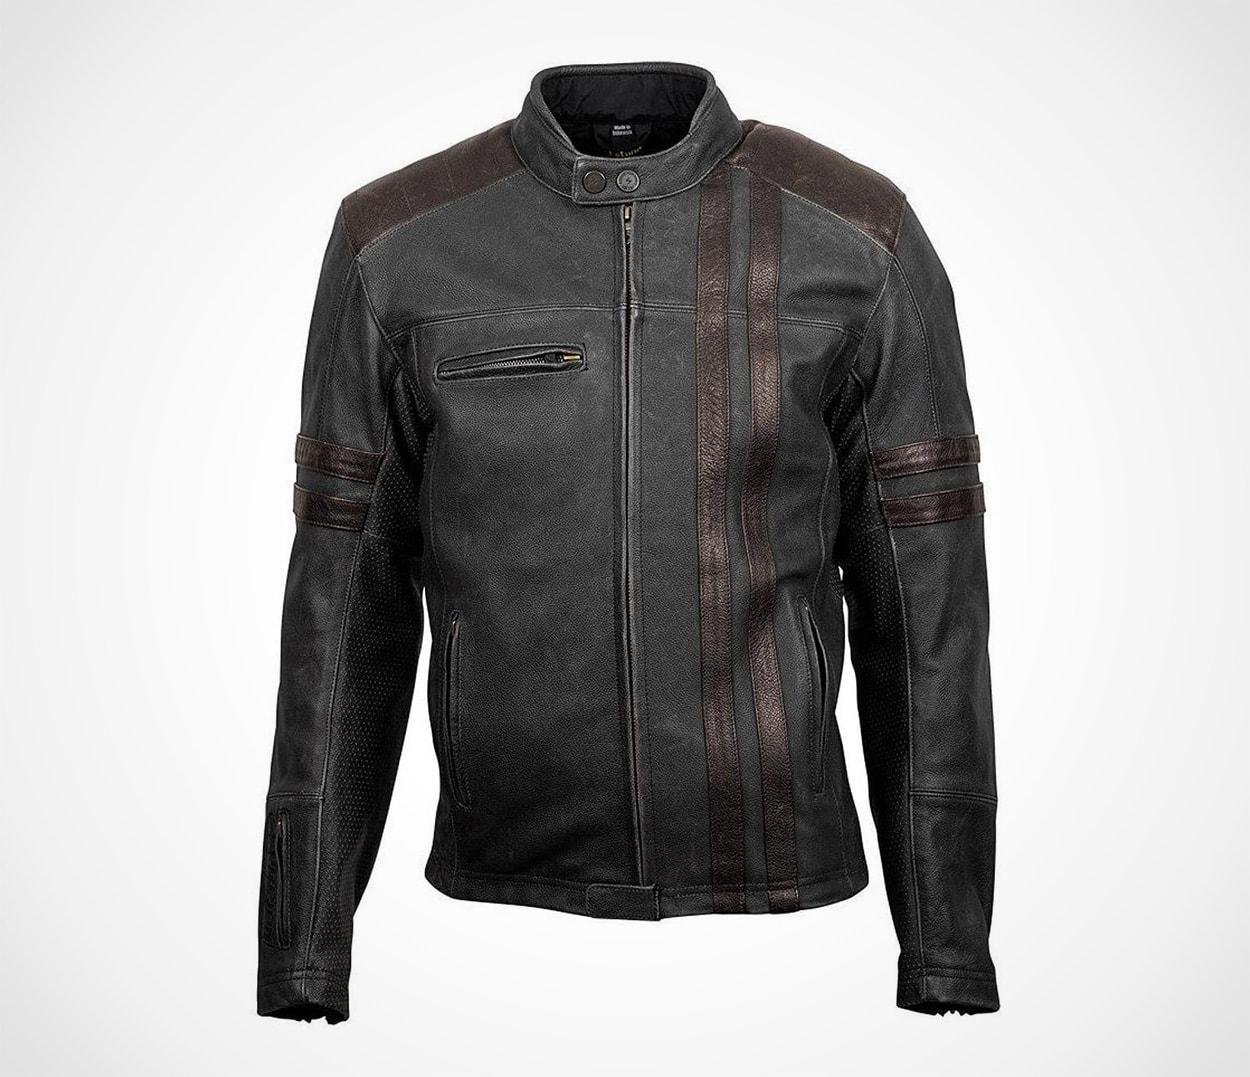 ScorpionExo 1909 Men's Leather Motorcycle Jacket